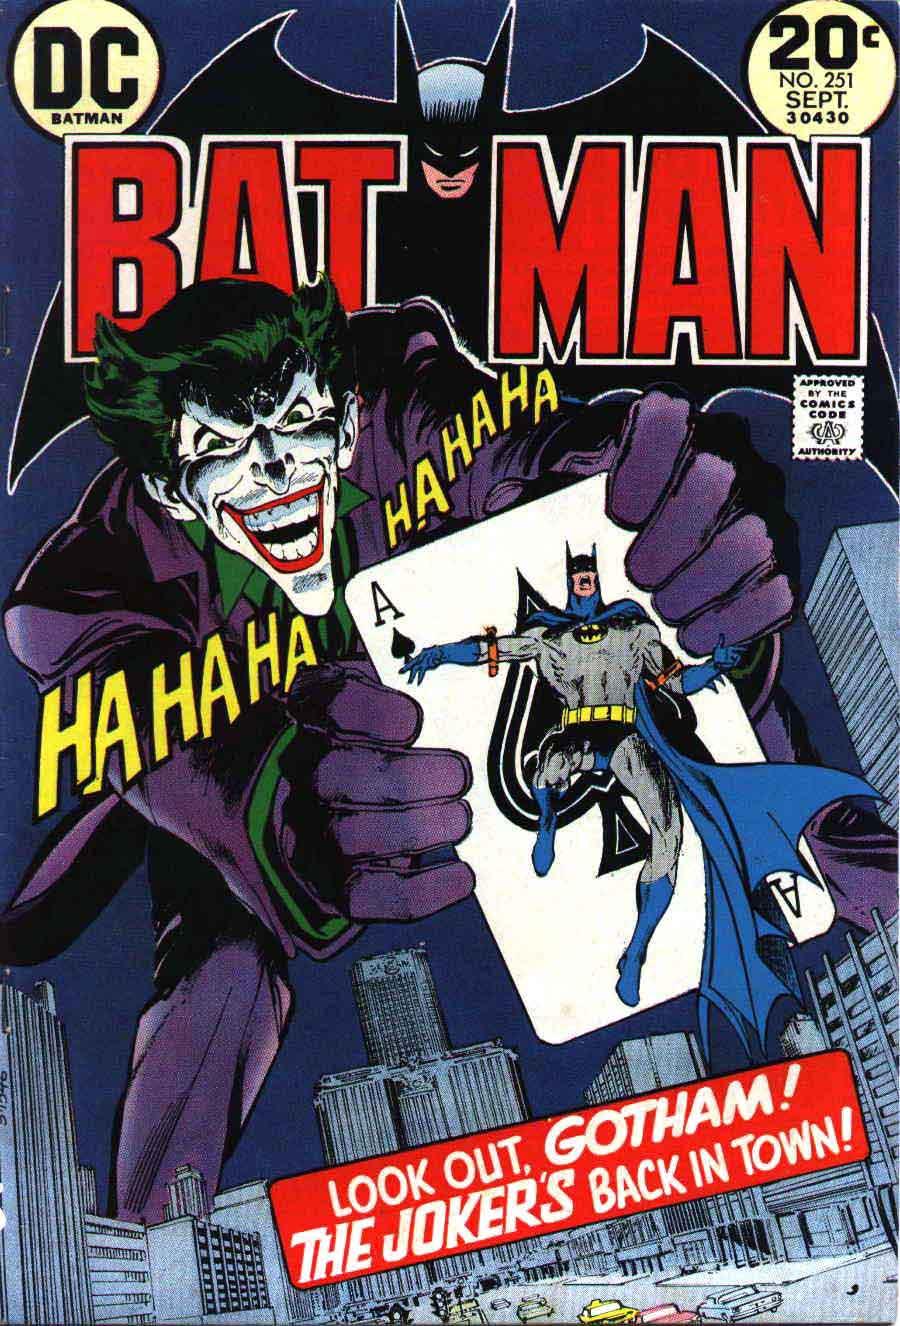 Catwoman clipart neal adams 1 Vol Vol team #251